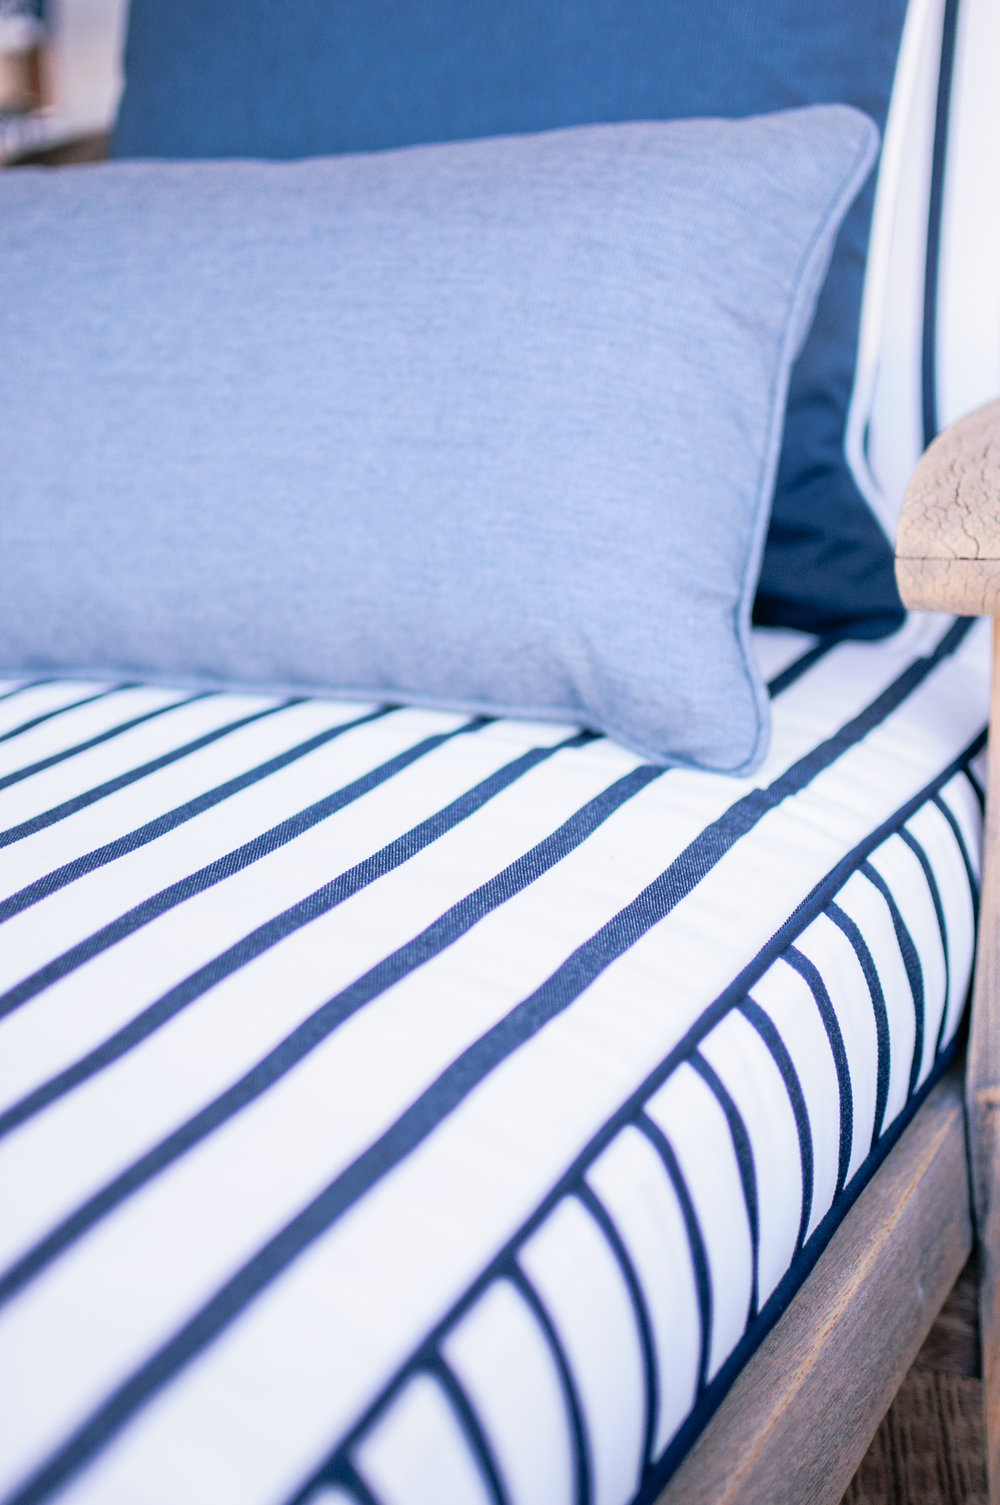 Calico-Sunbrella-Stripe-Fabric-Lido-in-Indigo-4.jpg